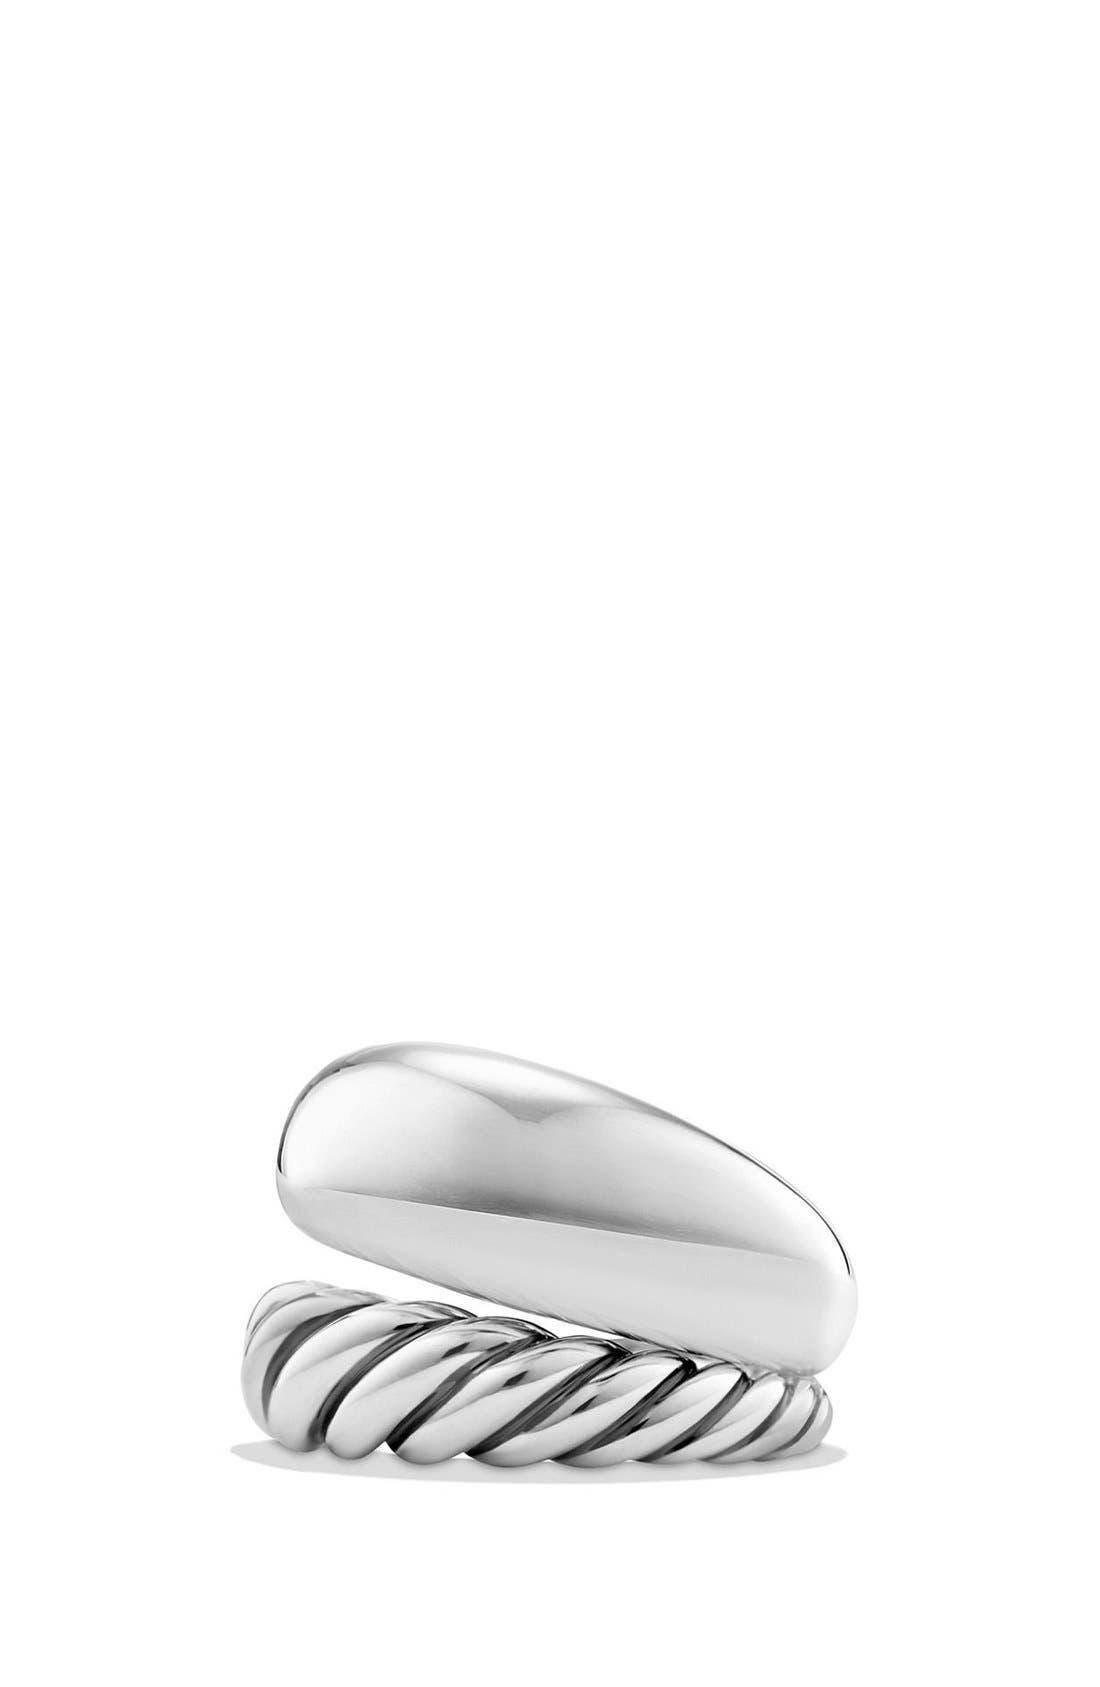 DAVID YURMAN 'Pure Form' Two Row Ring, Main, color, SILVER